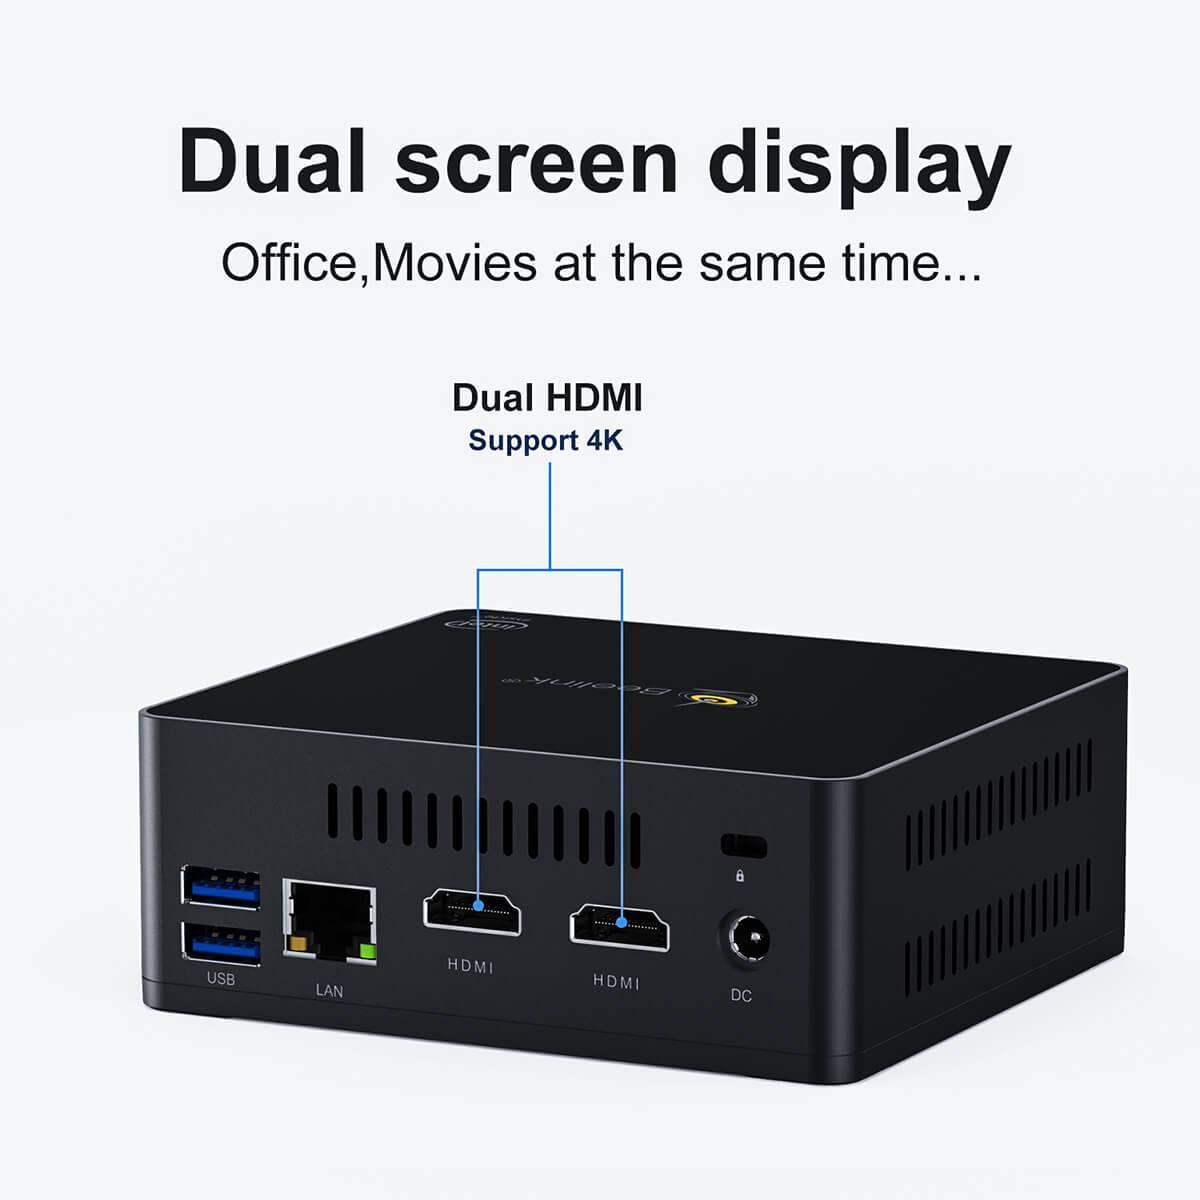 Beelink GK Mini Intel NUC Windows PC showing dual-screen feature